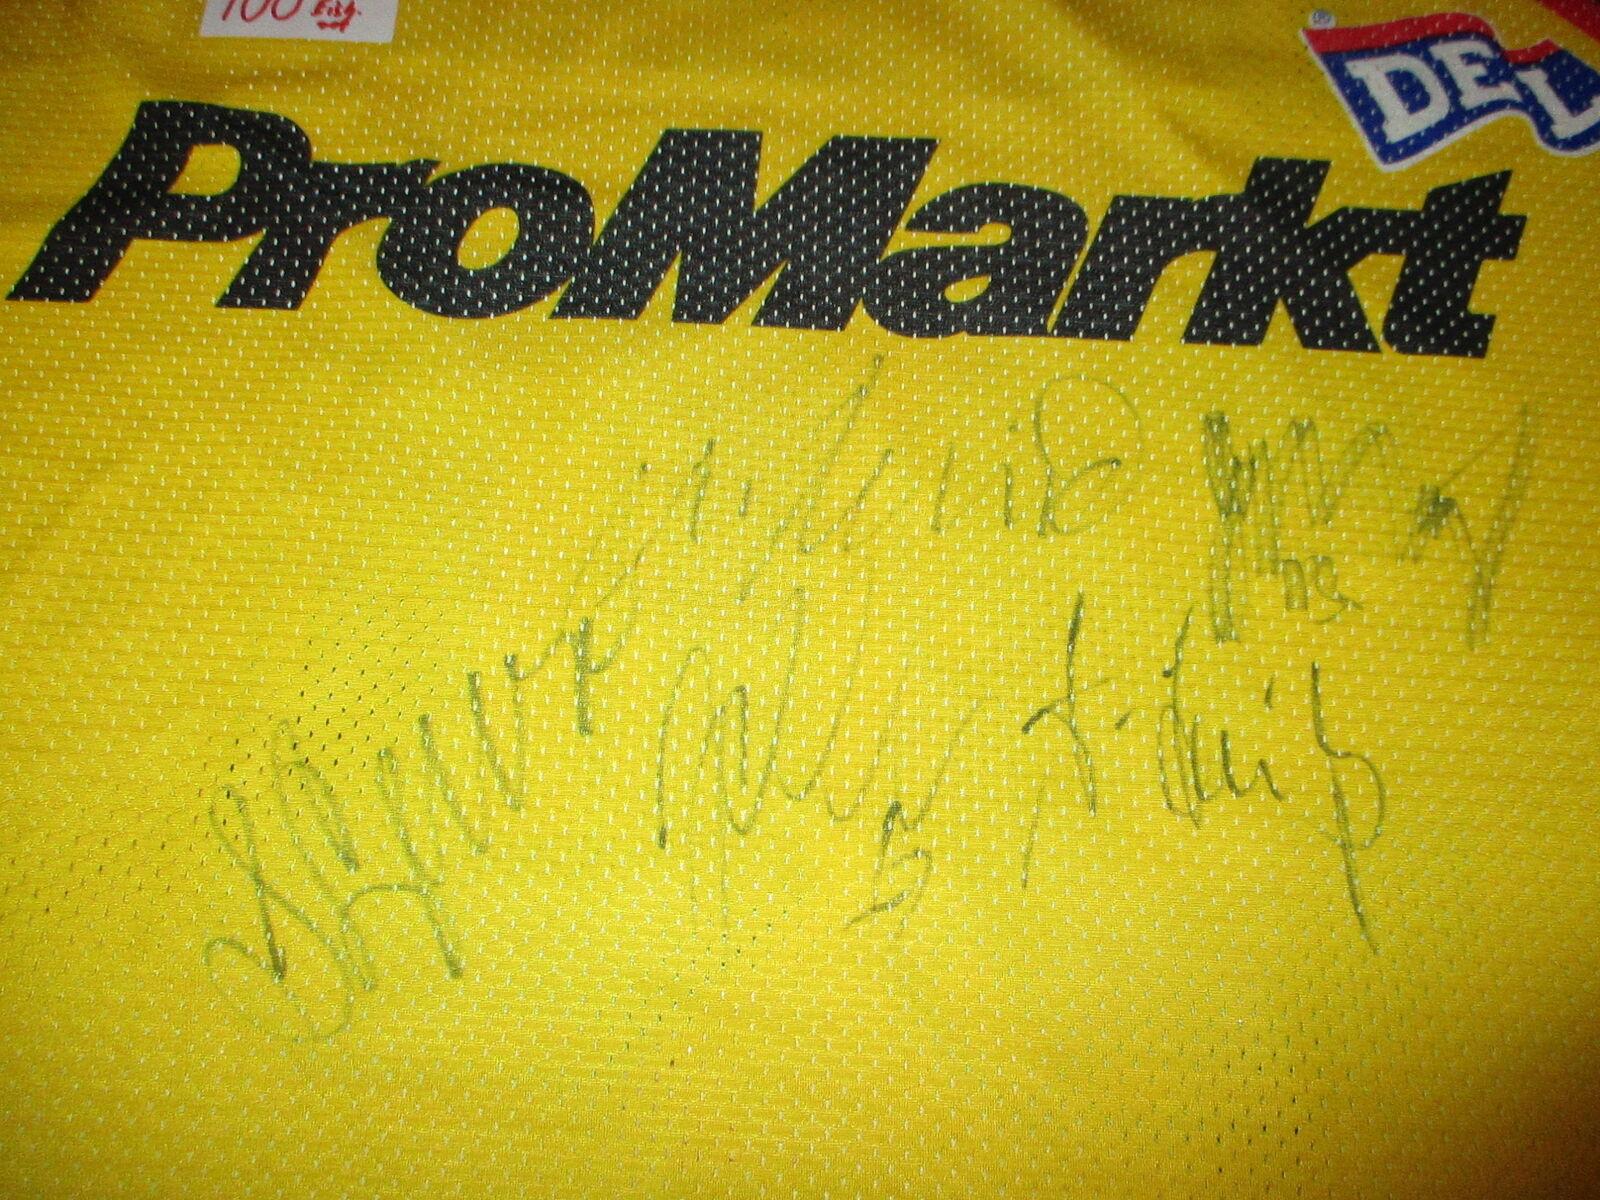 Kölner Kölner Kölner Haie Original Trikot 1994 95 + Nr.30 Hohenberger + Handsigniert Gr.XL TOP   | Marke  | Marke  | Deutschland Shops  f7d76d